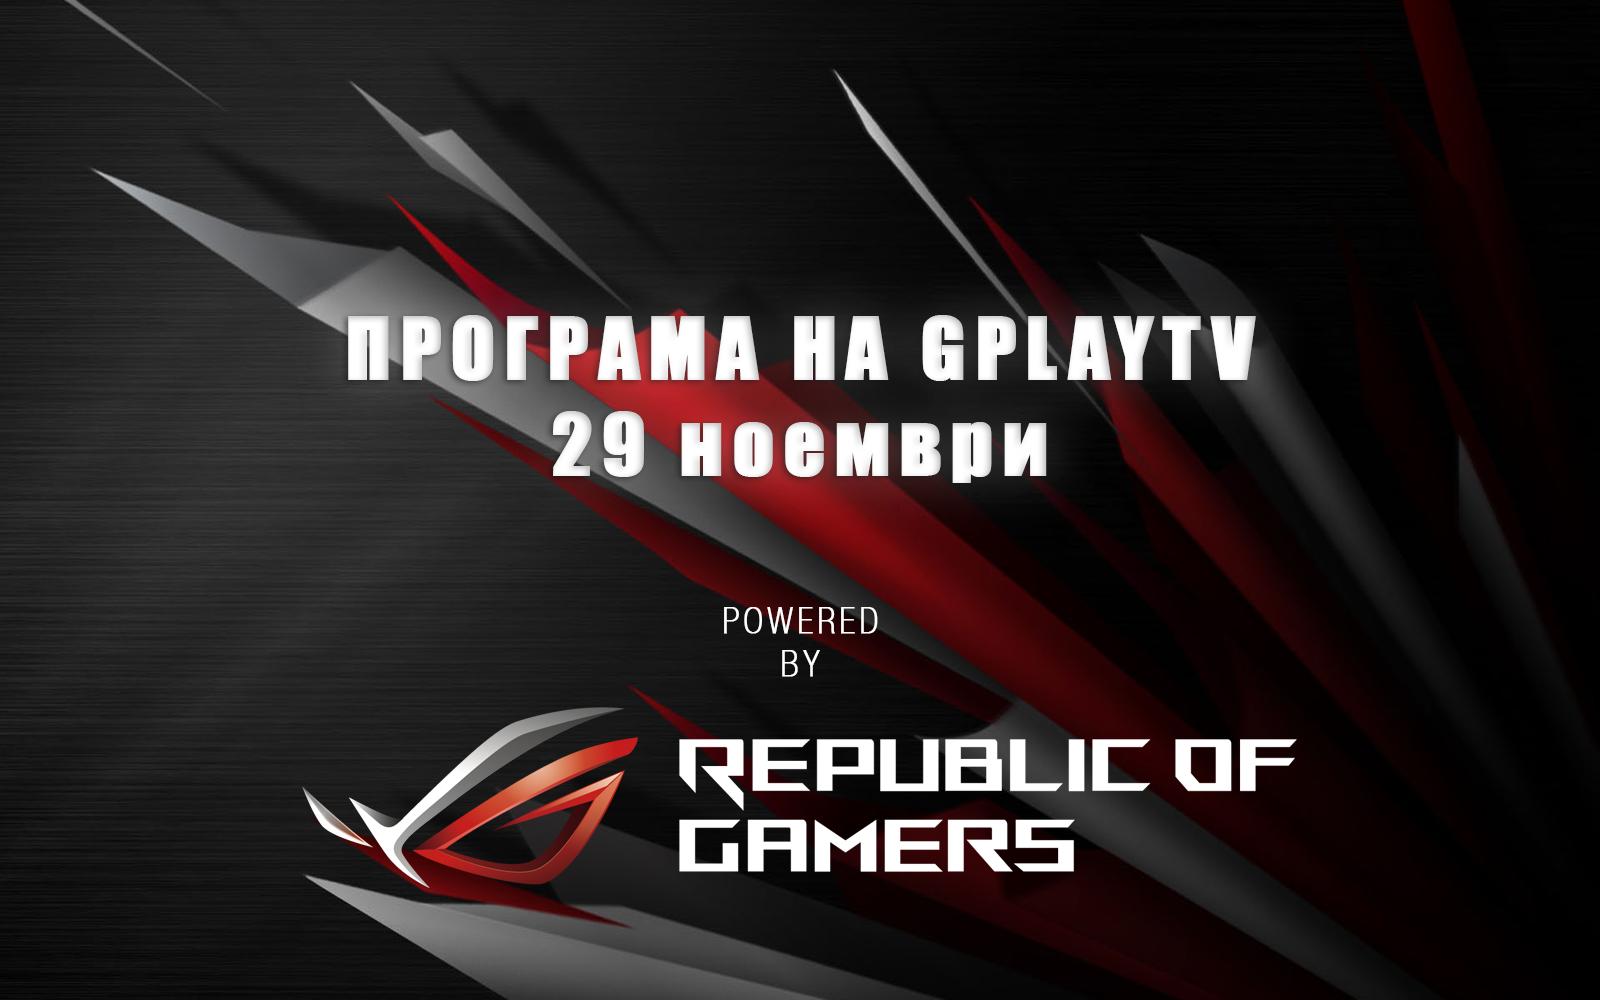 GPLAY TV Program 29.11